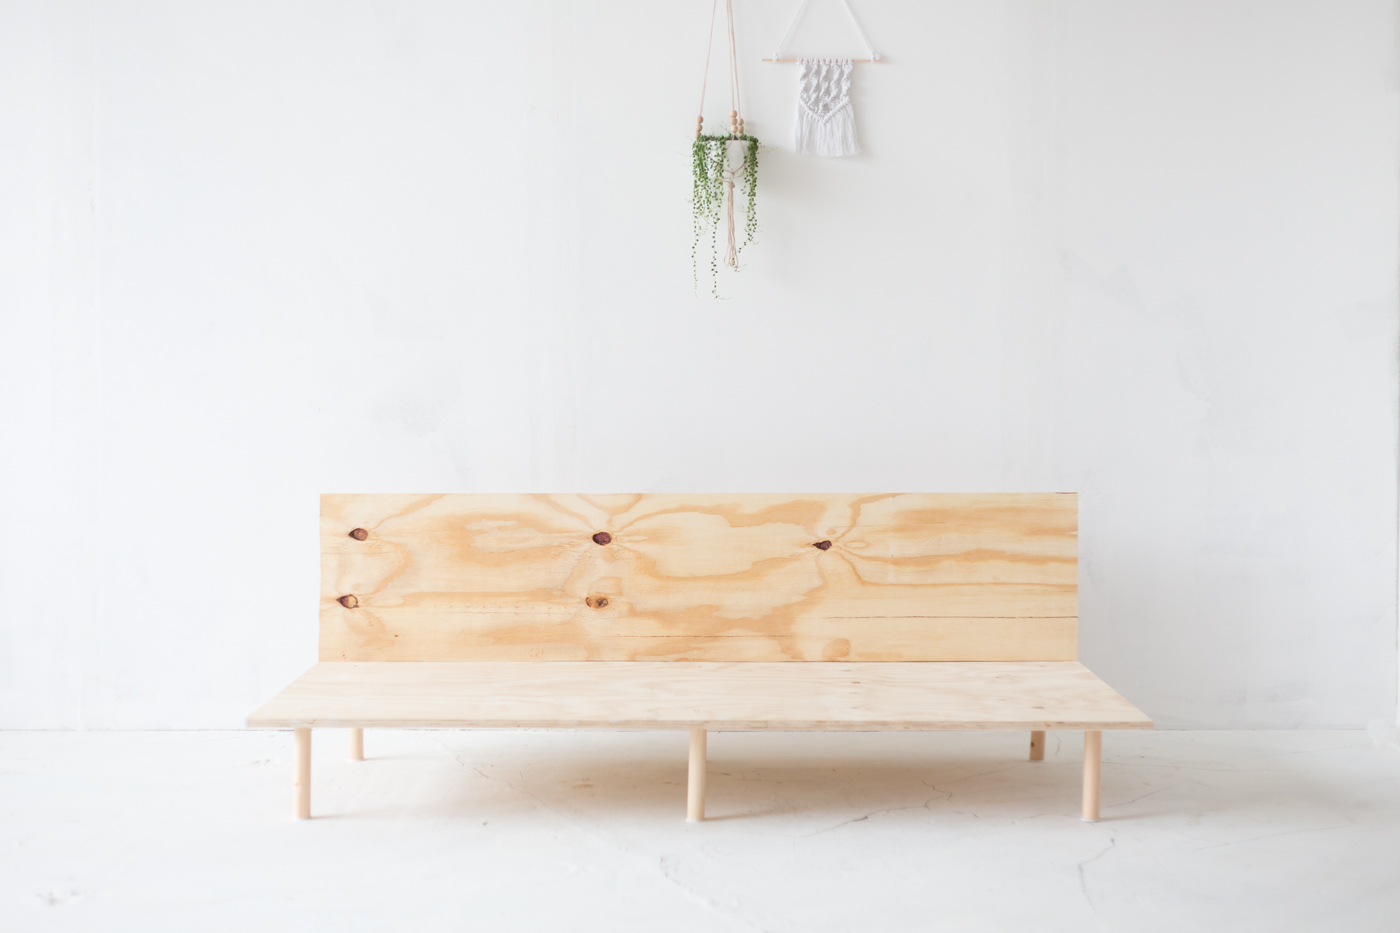 sofa framework tutorial im king we todd did jokes like that the honoroak